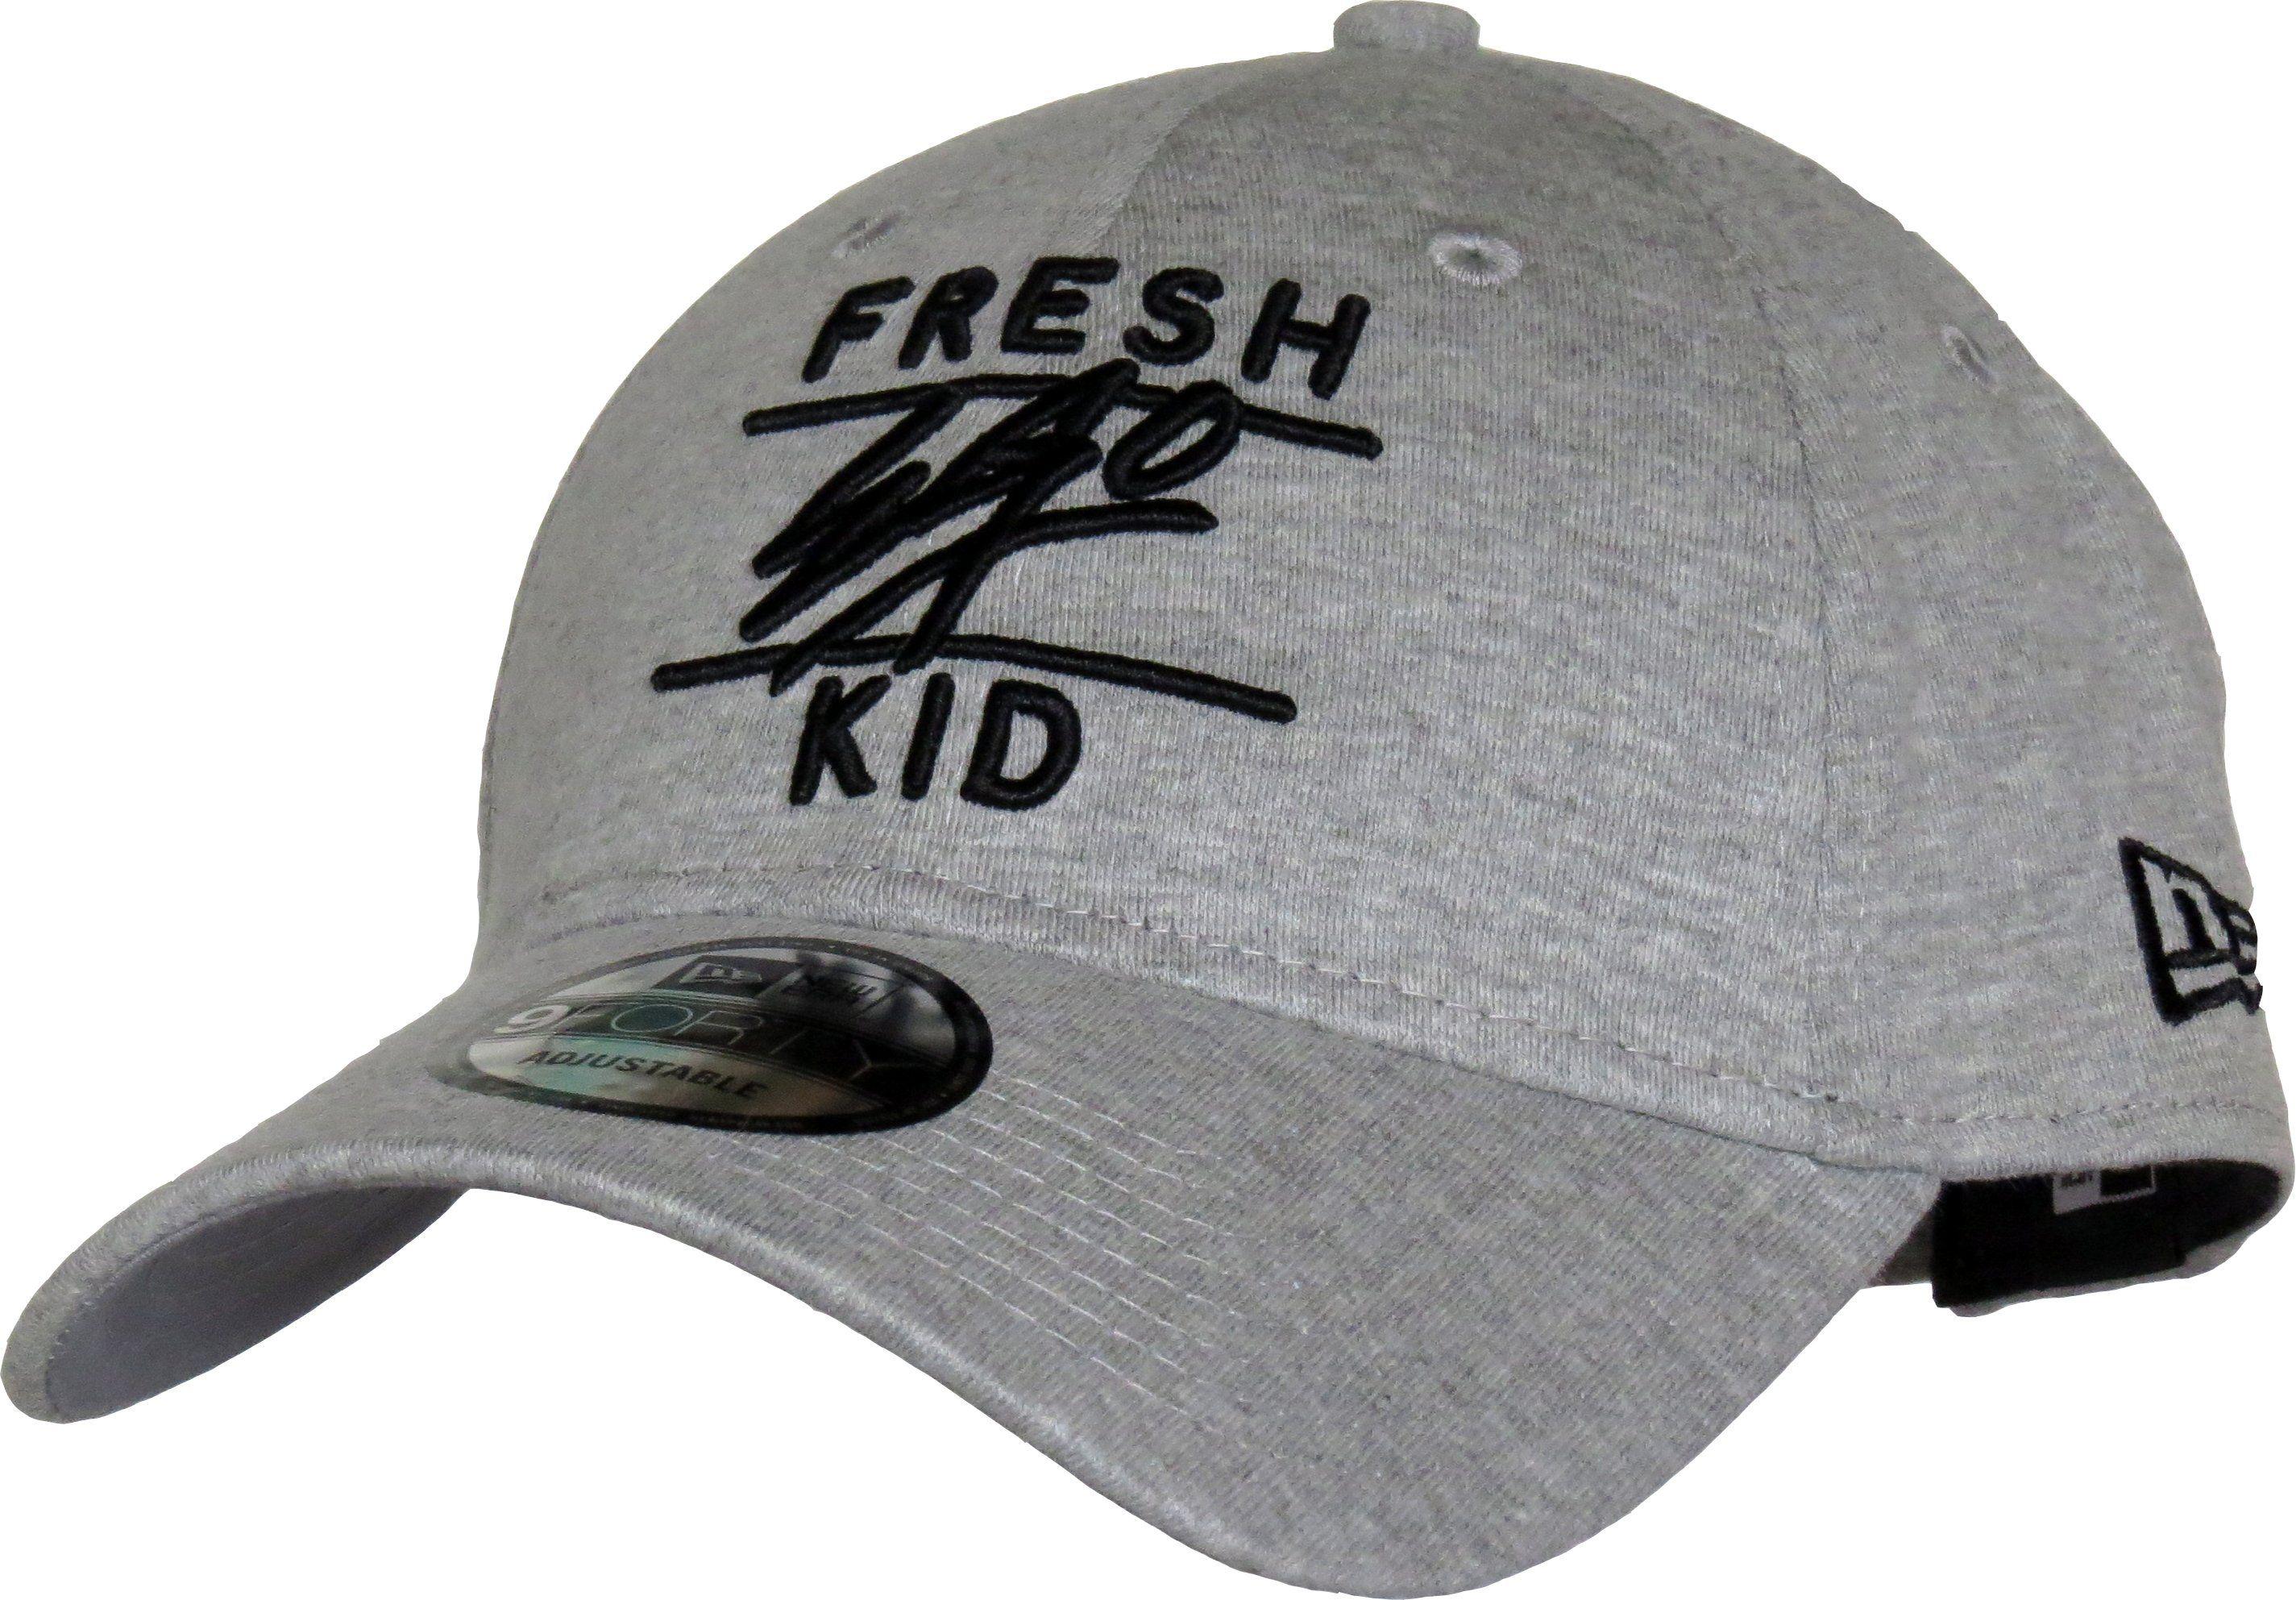 4c294fd21b7 Fresh Ego Kid New Era 940 Grey Black Jersey Baseball Cap – lovemycap